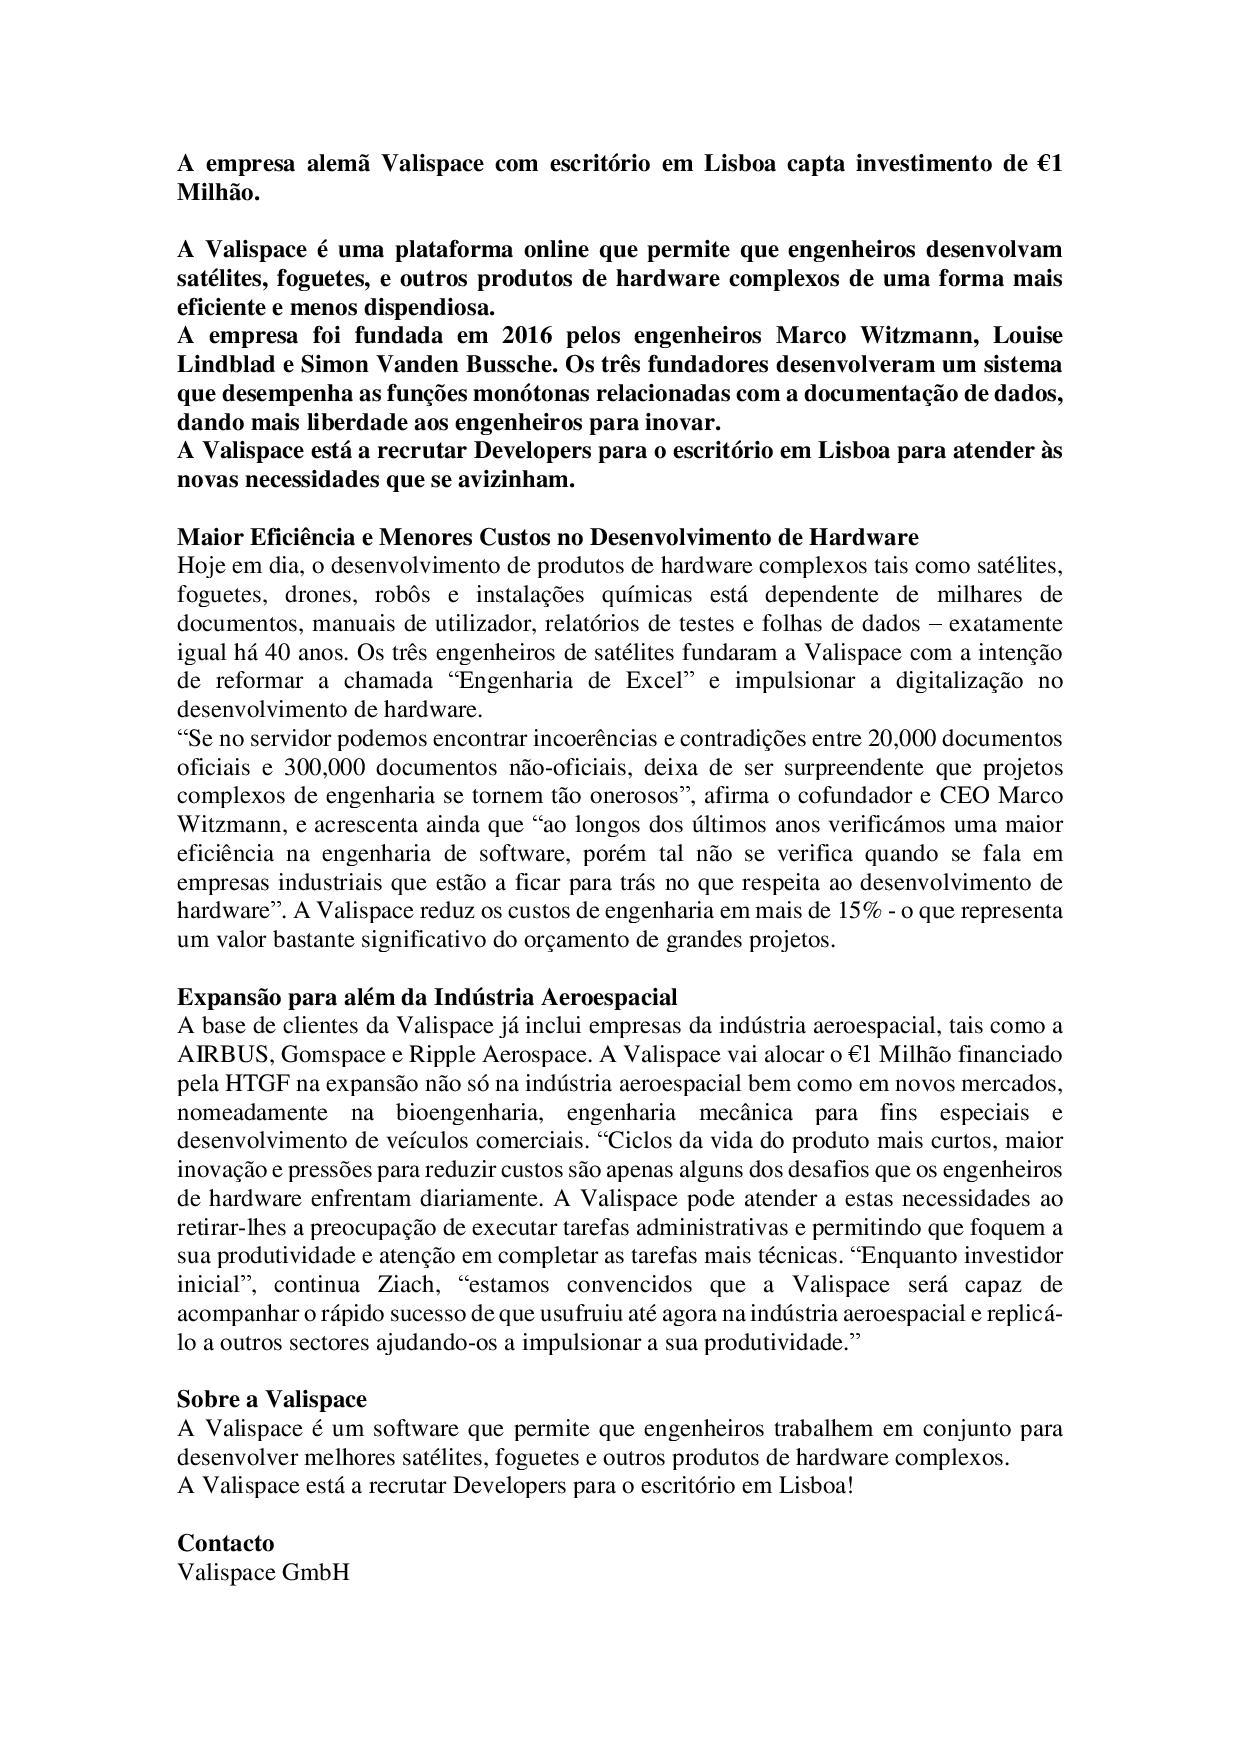 Press-release_Final_Valispace-page-001.jpg